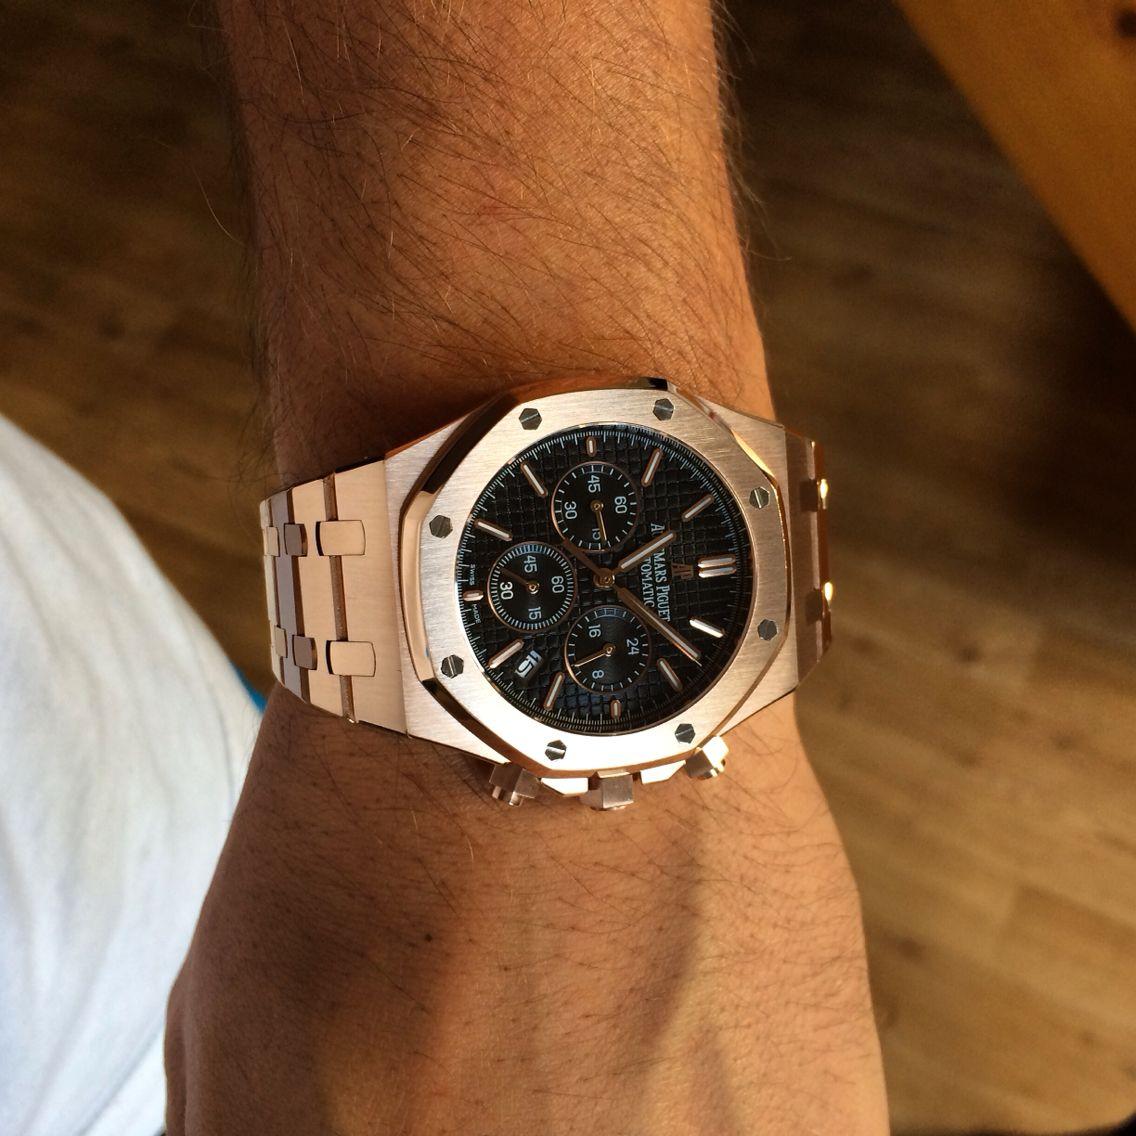 Audemars Piguet Royal Oak Chronograph Pink Gold | Luxury ...